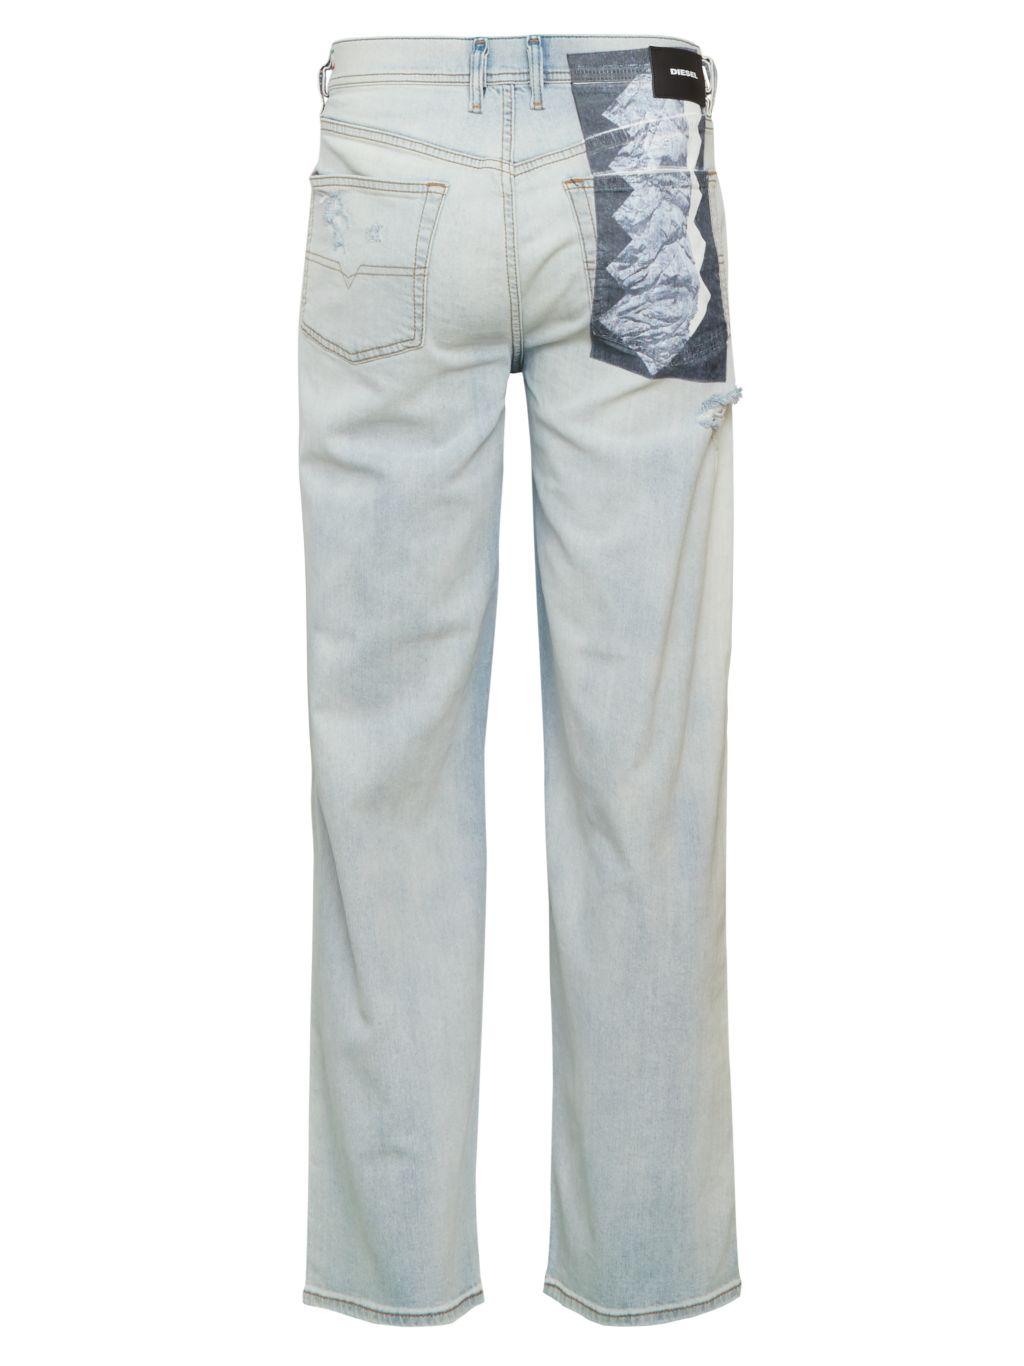 Diesel Dagh Ripped Jeans